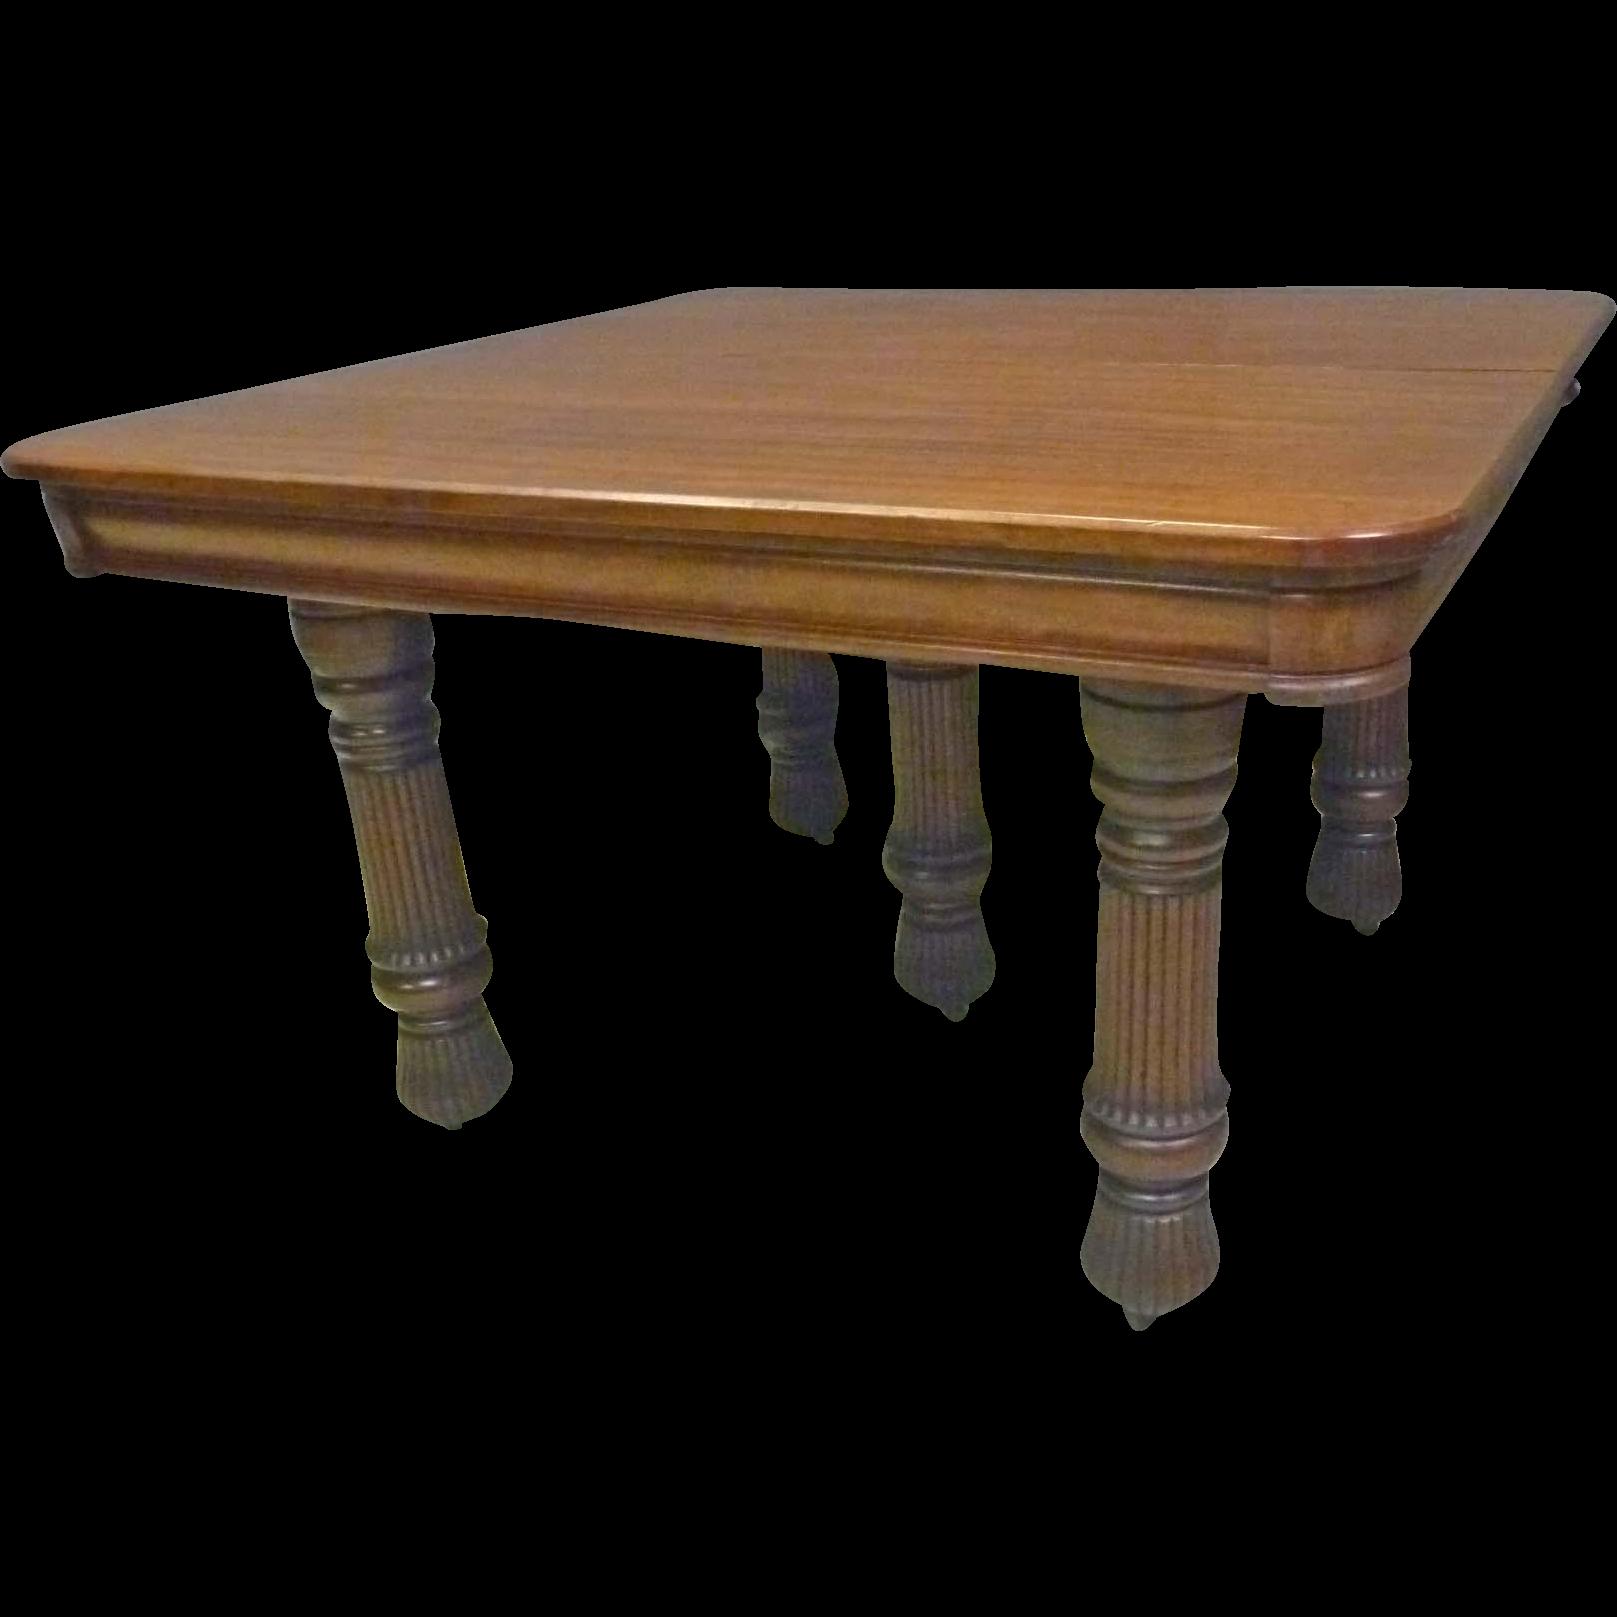 Square Mahogany Dining Table